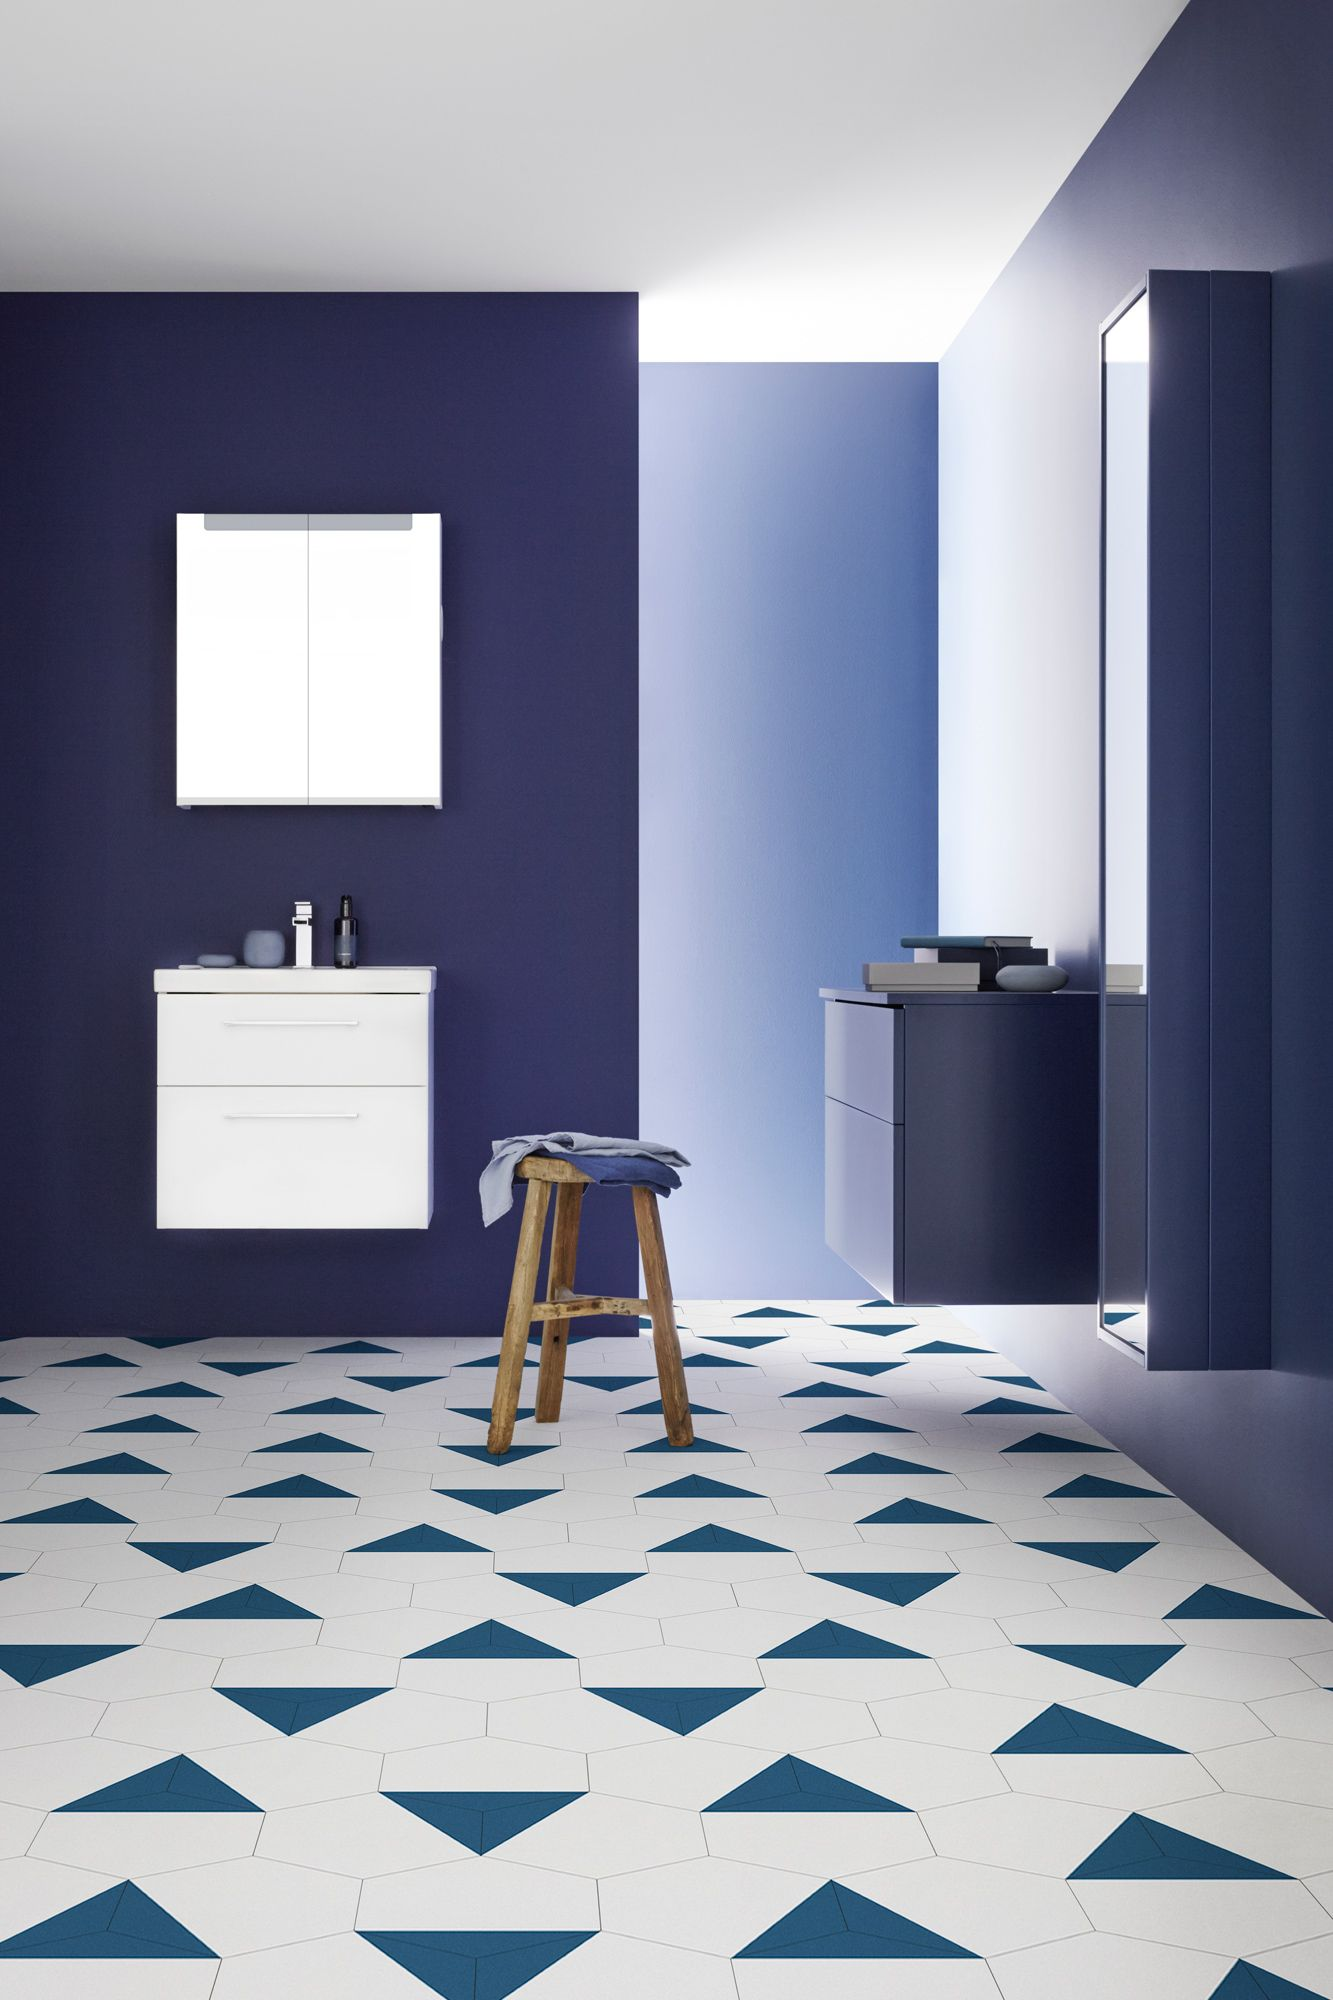 salle de bains bleu marine inredning pinterest aspen badrum och inredning. Black Bedroom Furniture Sets. Home Design Ideas